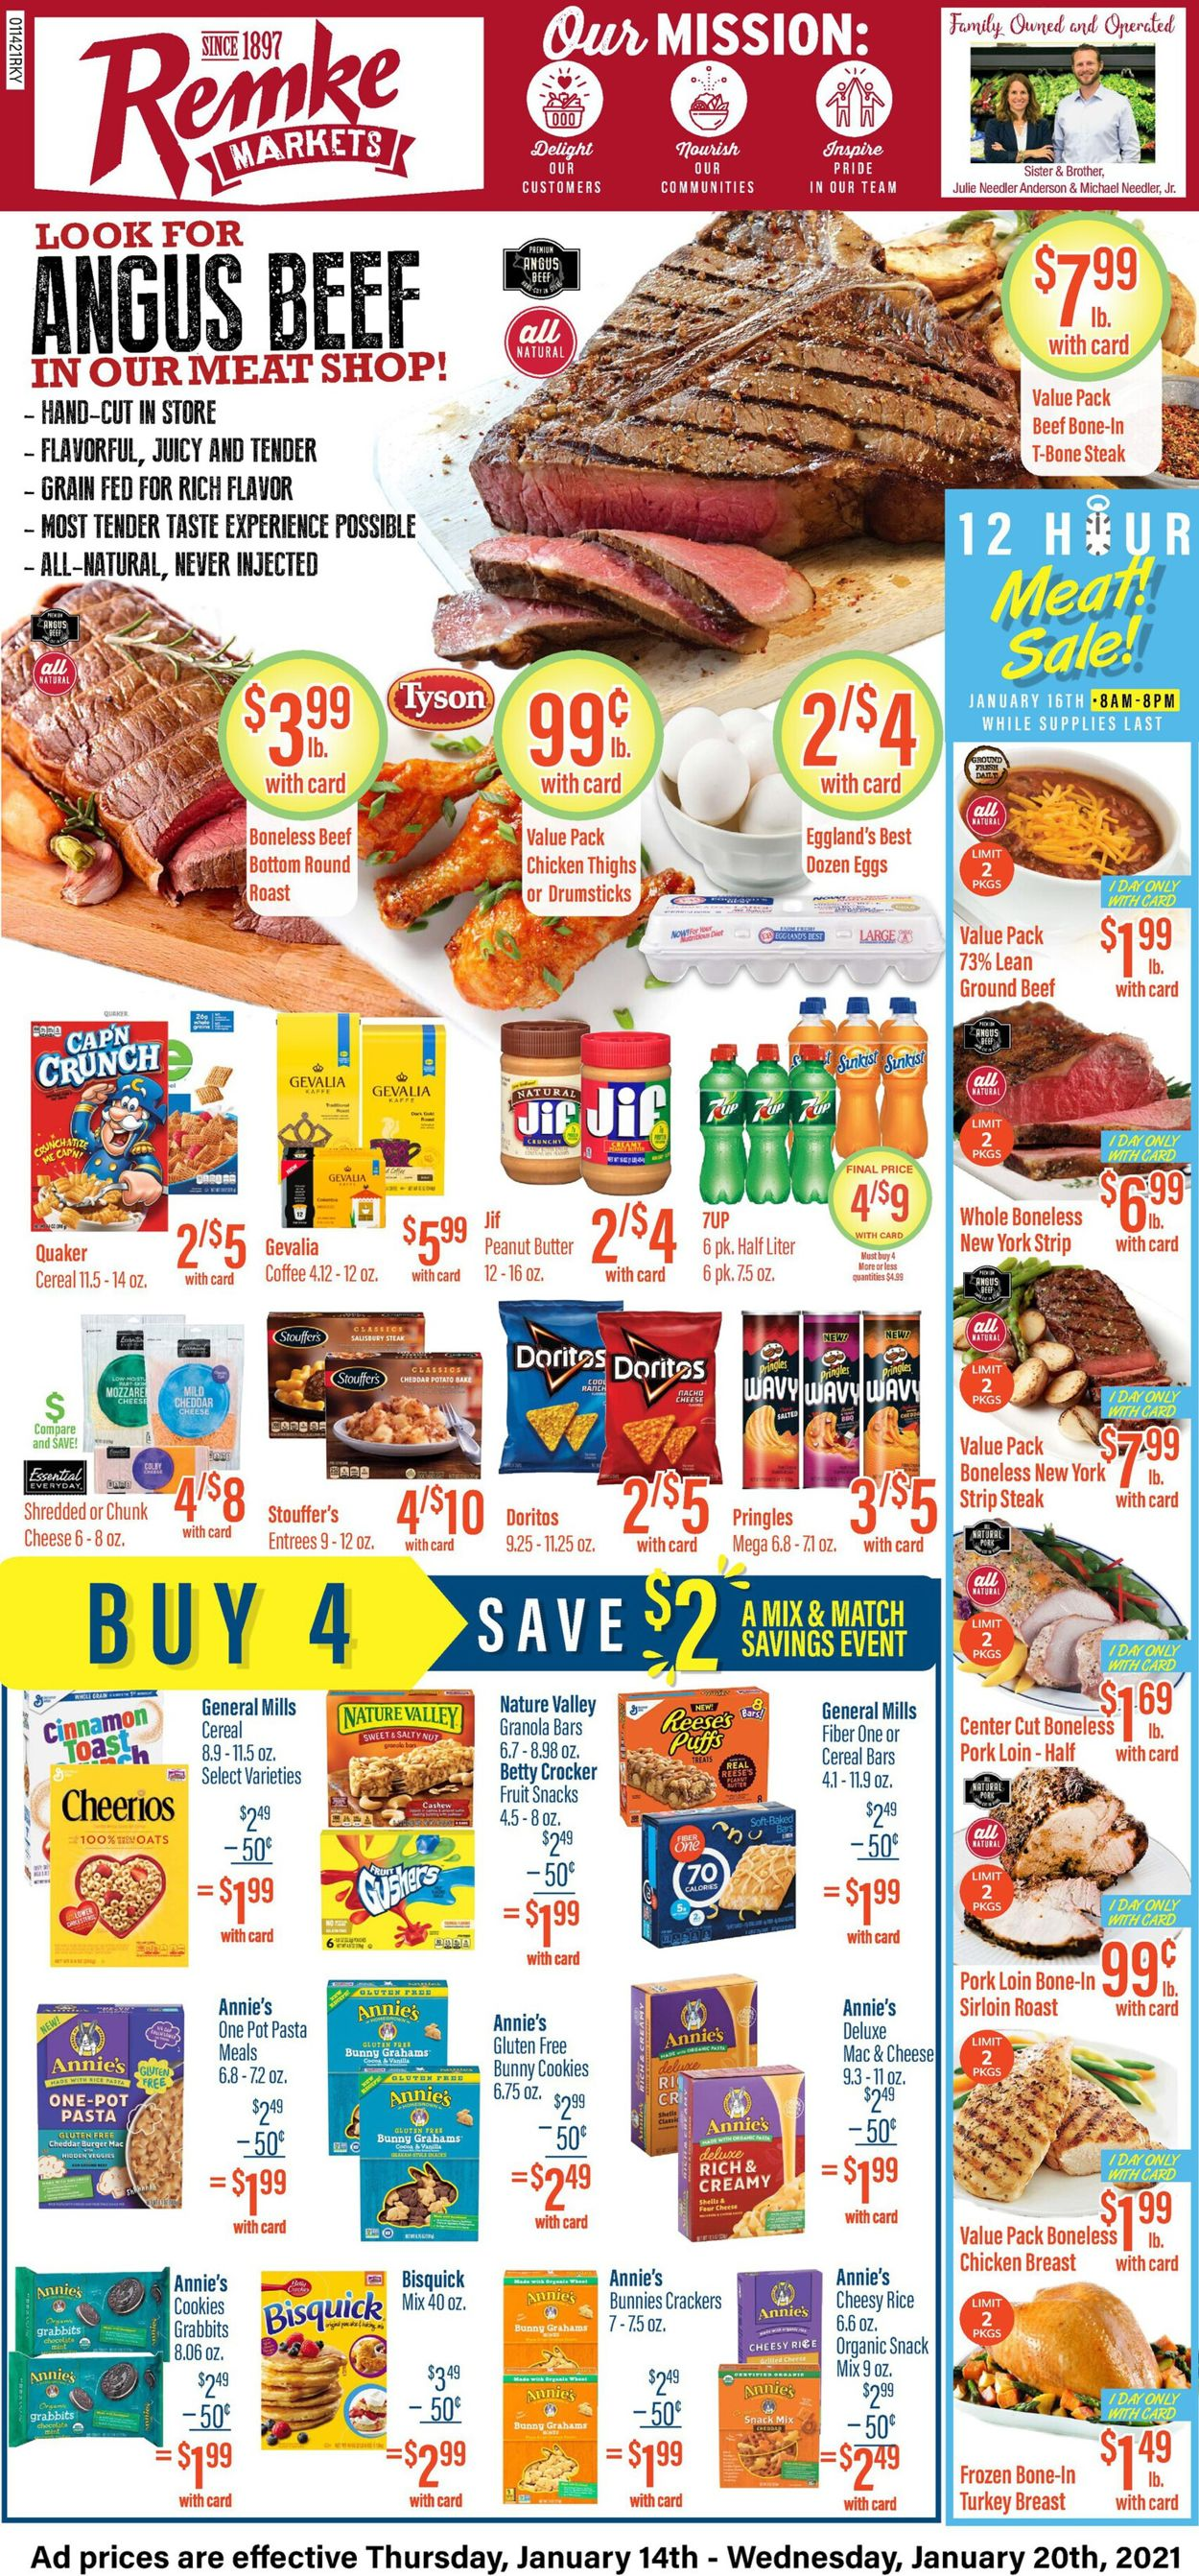 Remke Markets Weekly Ad Circular - valid 01/14-01/20/2021